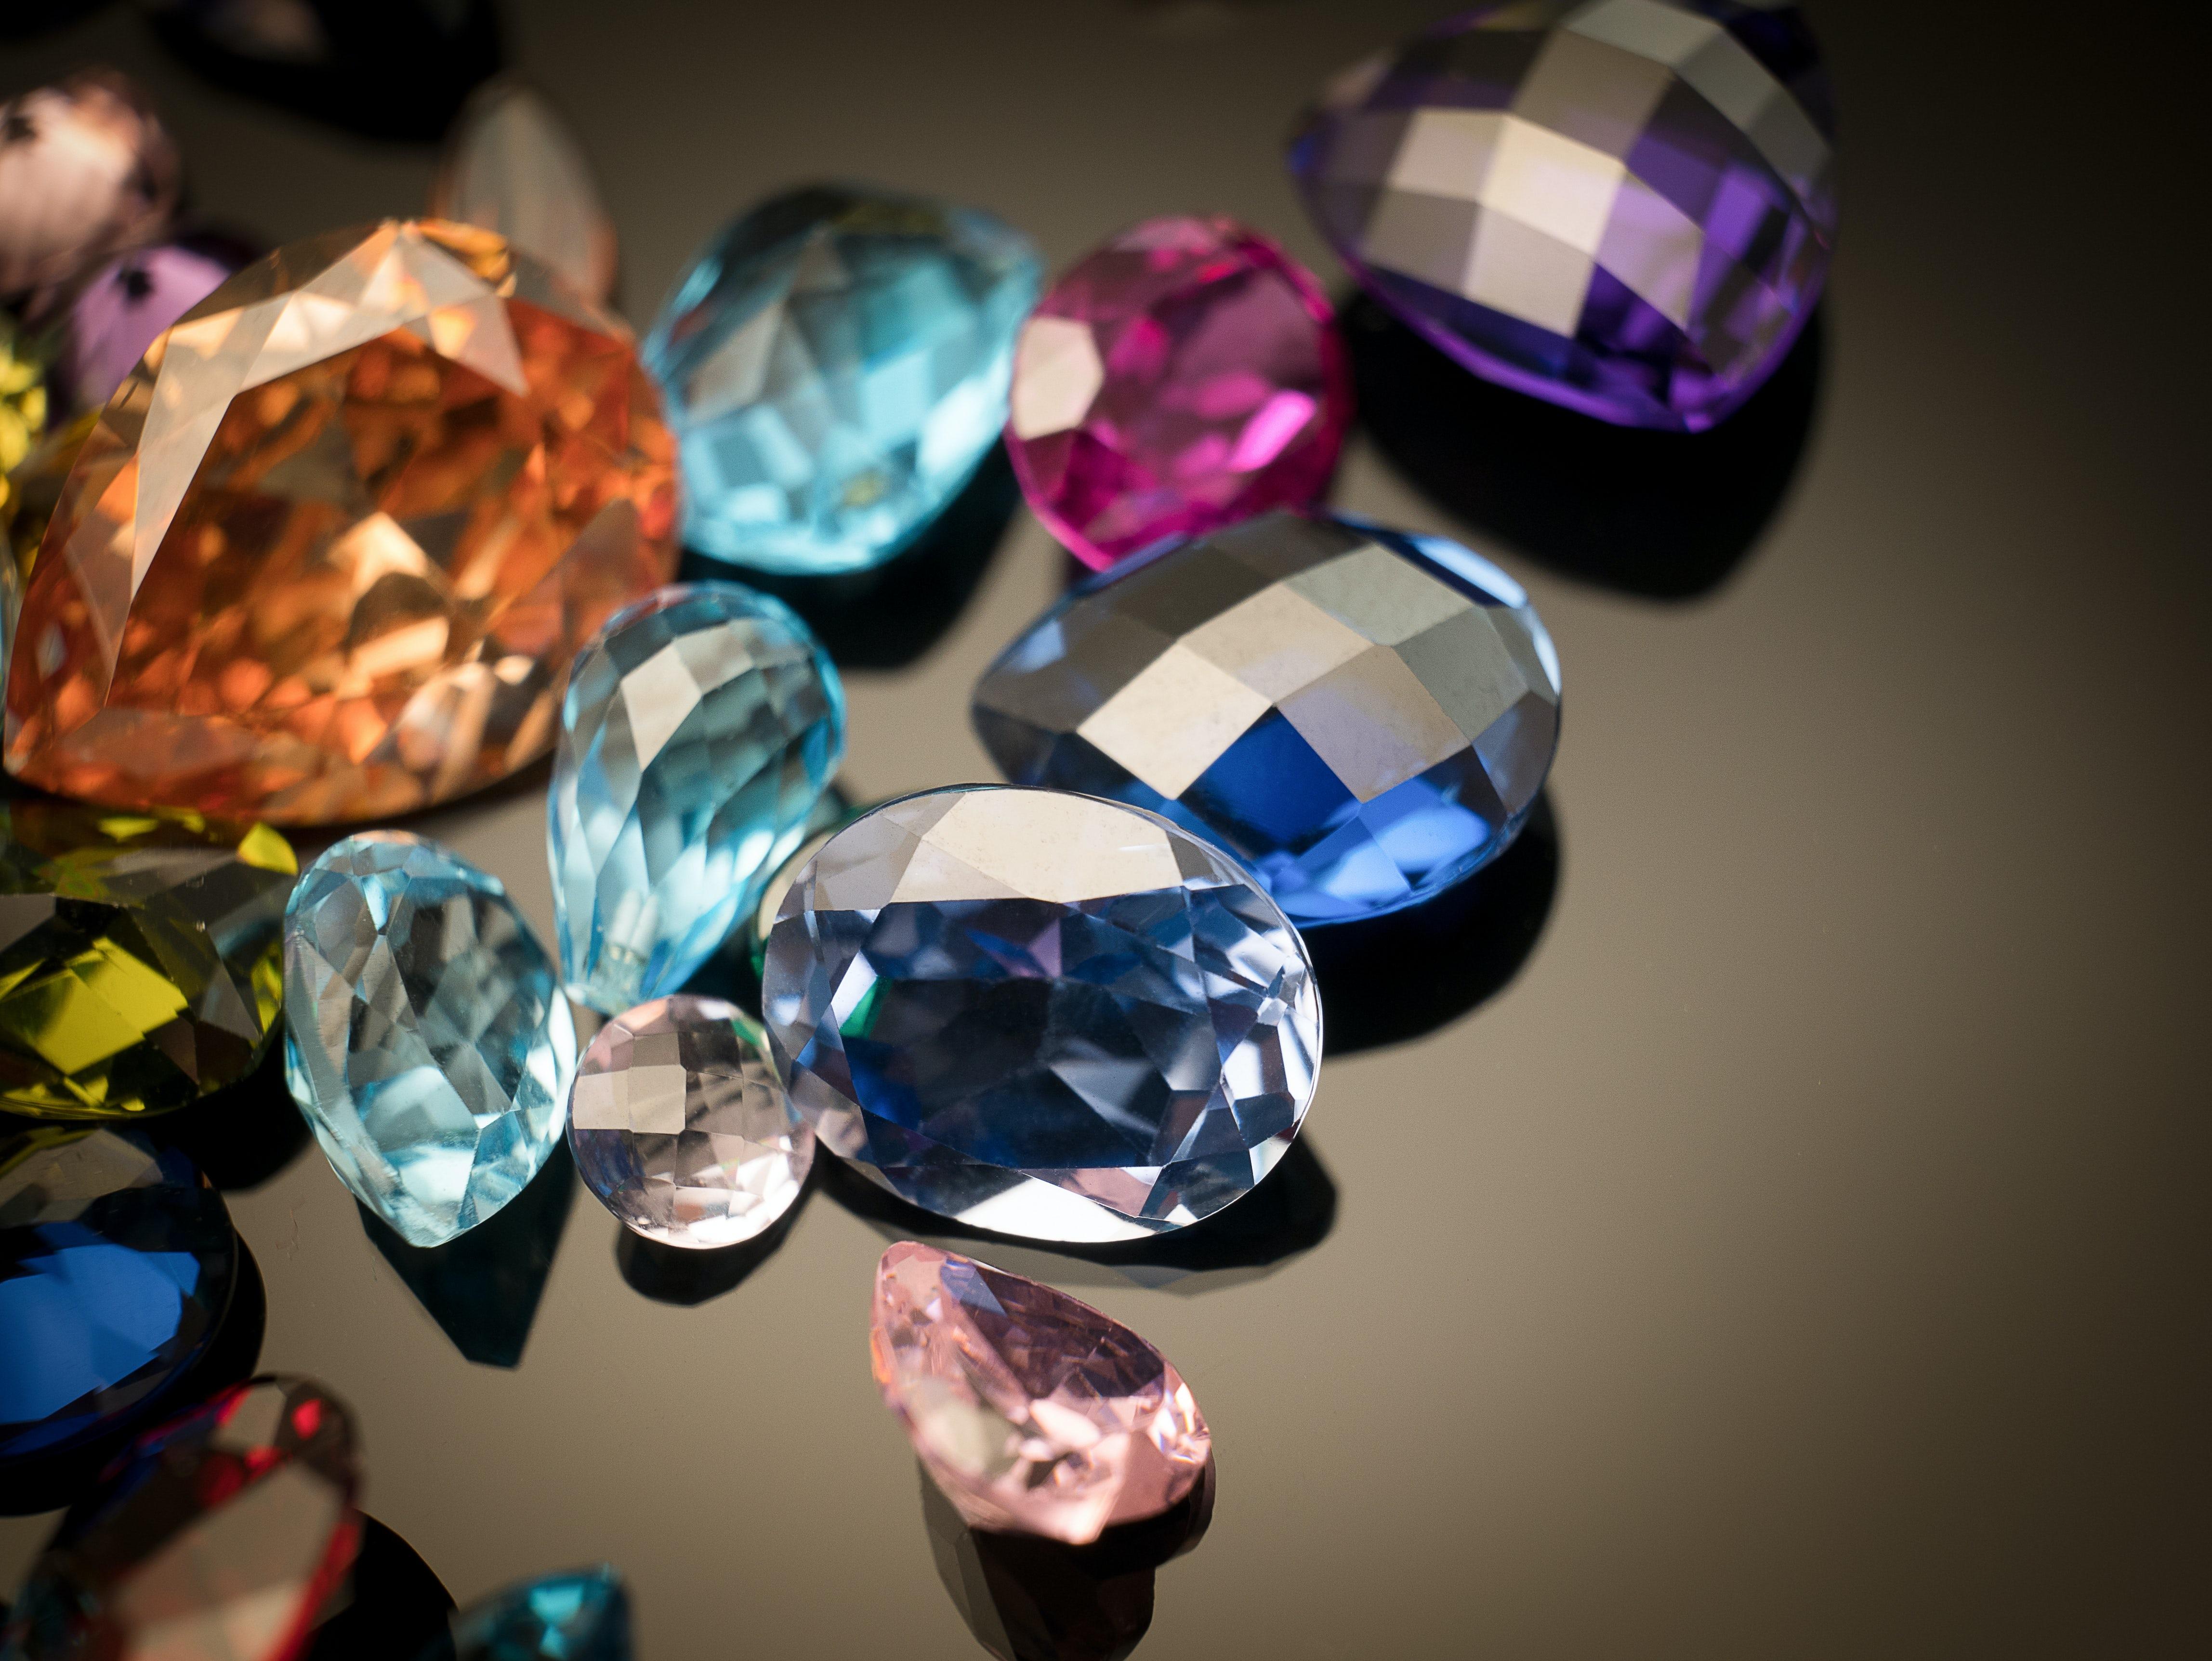 Coloured gemstones   Source: Shutterstock